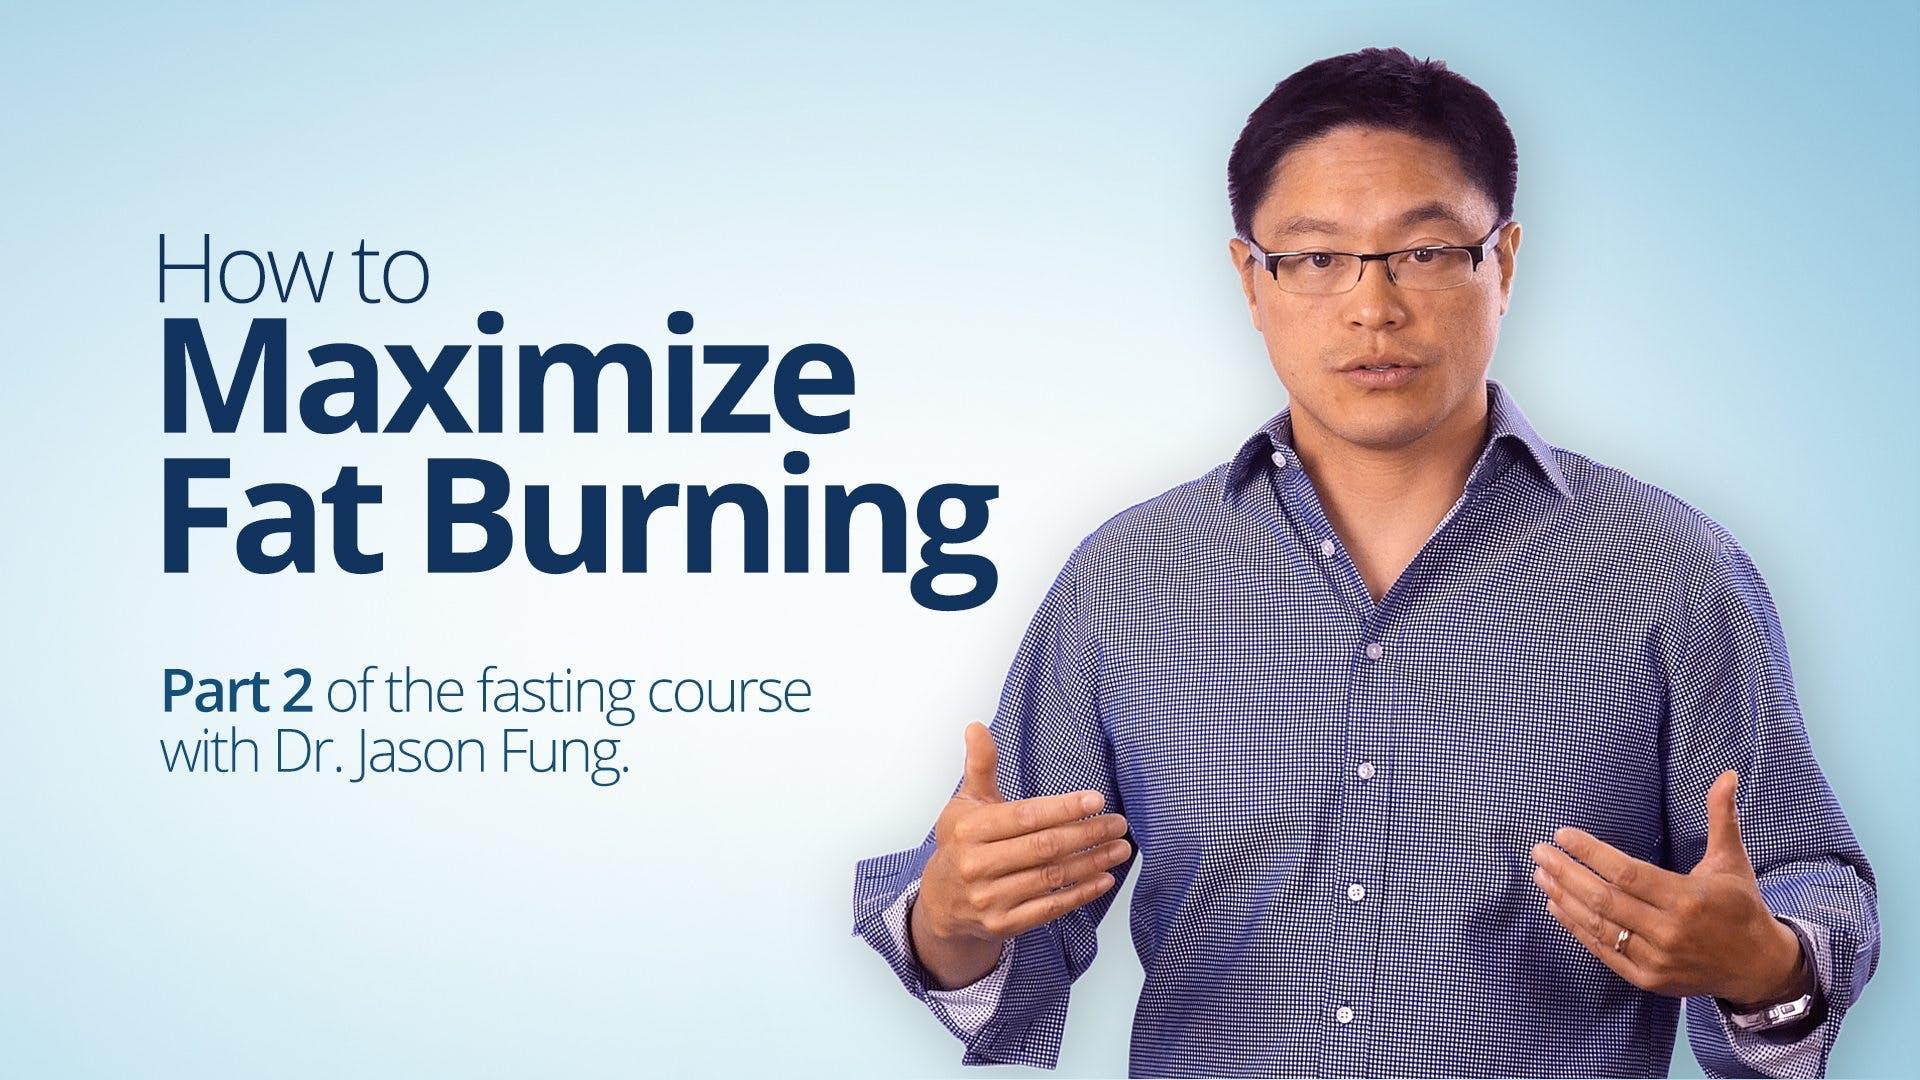 How to maximize fat burning